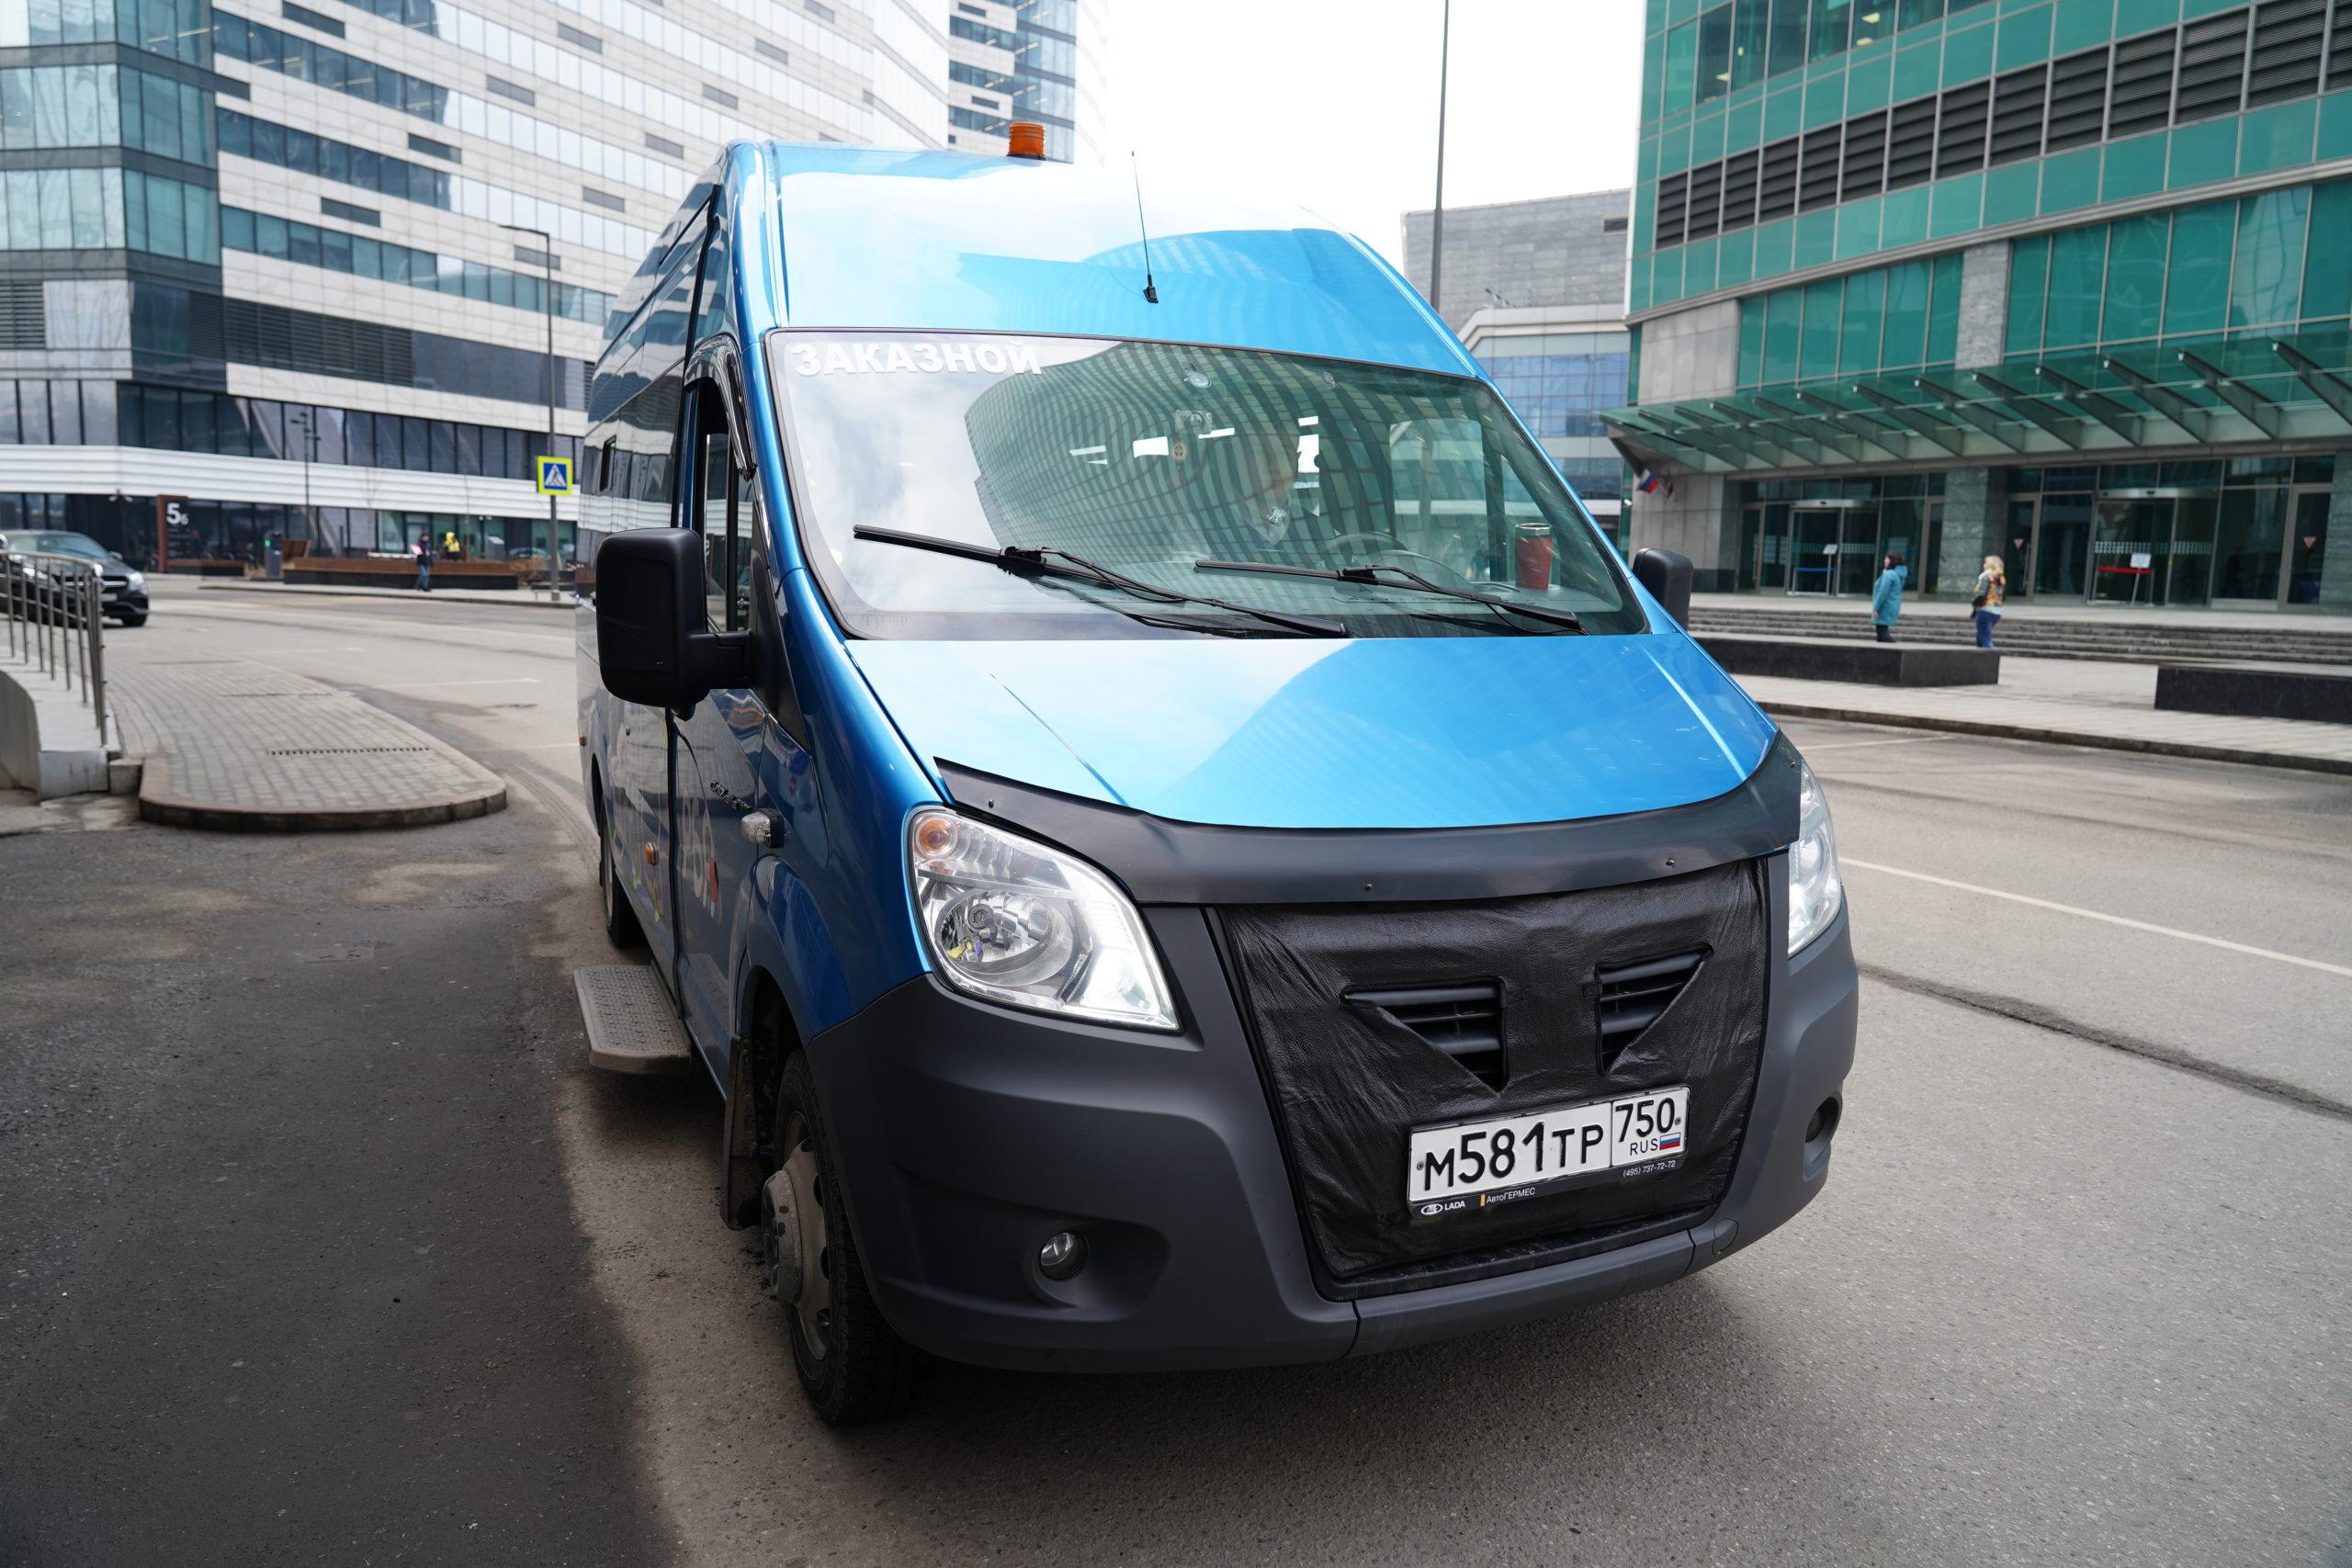 GLZ05647 scaled - Закажите автобус, или микроавтобус сейчас!